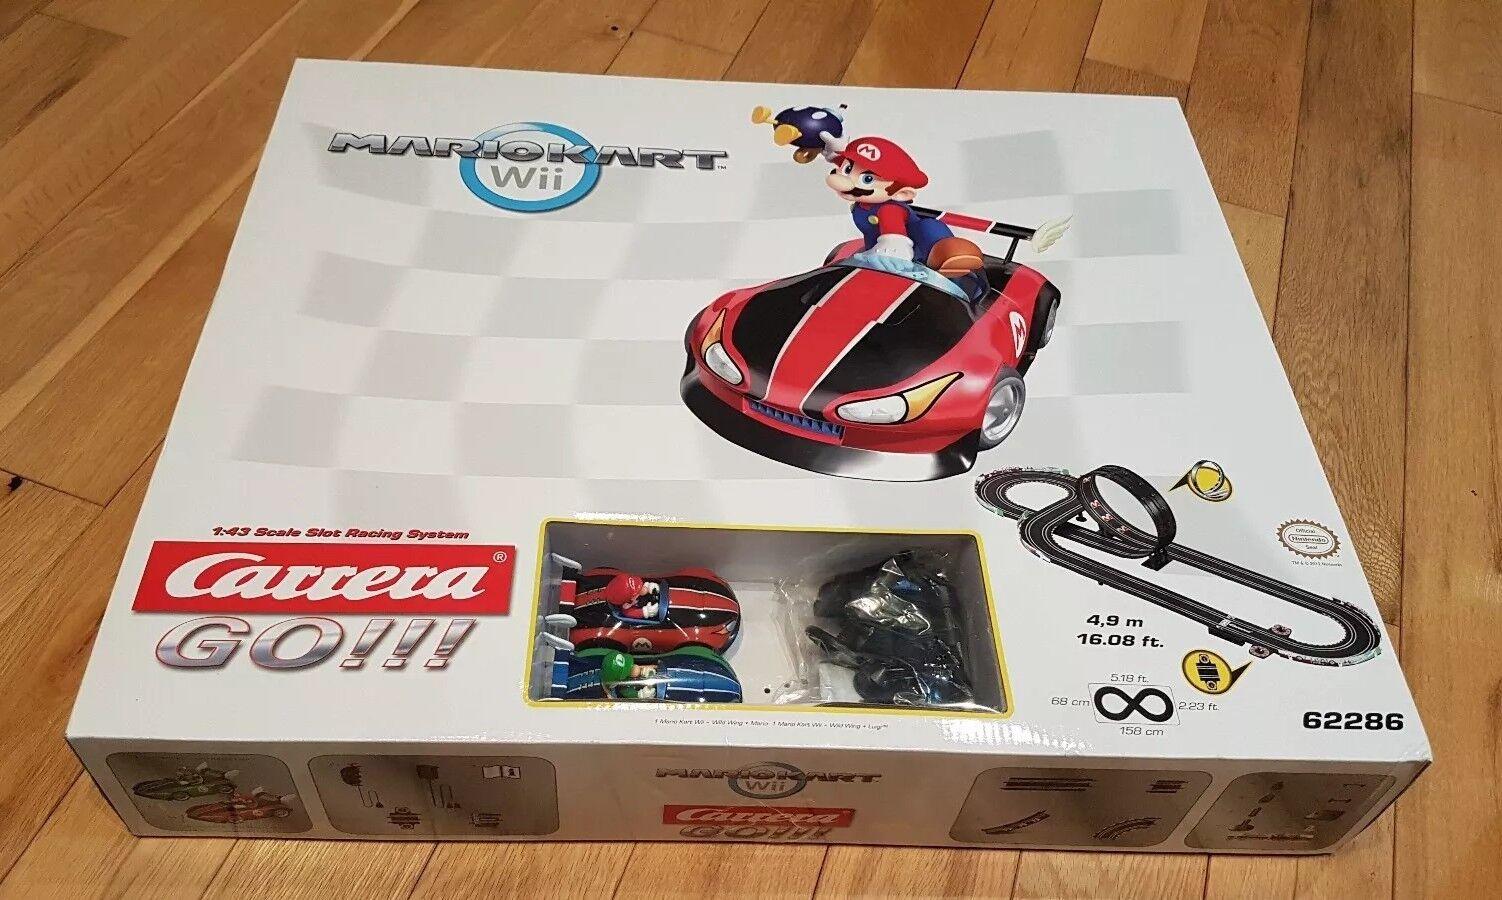 Carrera GO    MARIO KART Wii slot system Scalextric. Wild wing Mario & Luigi